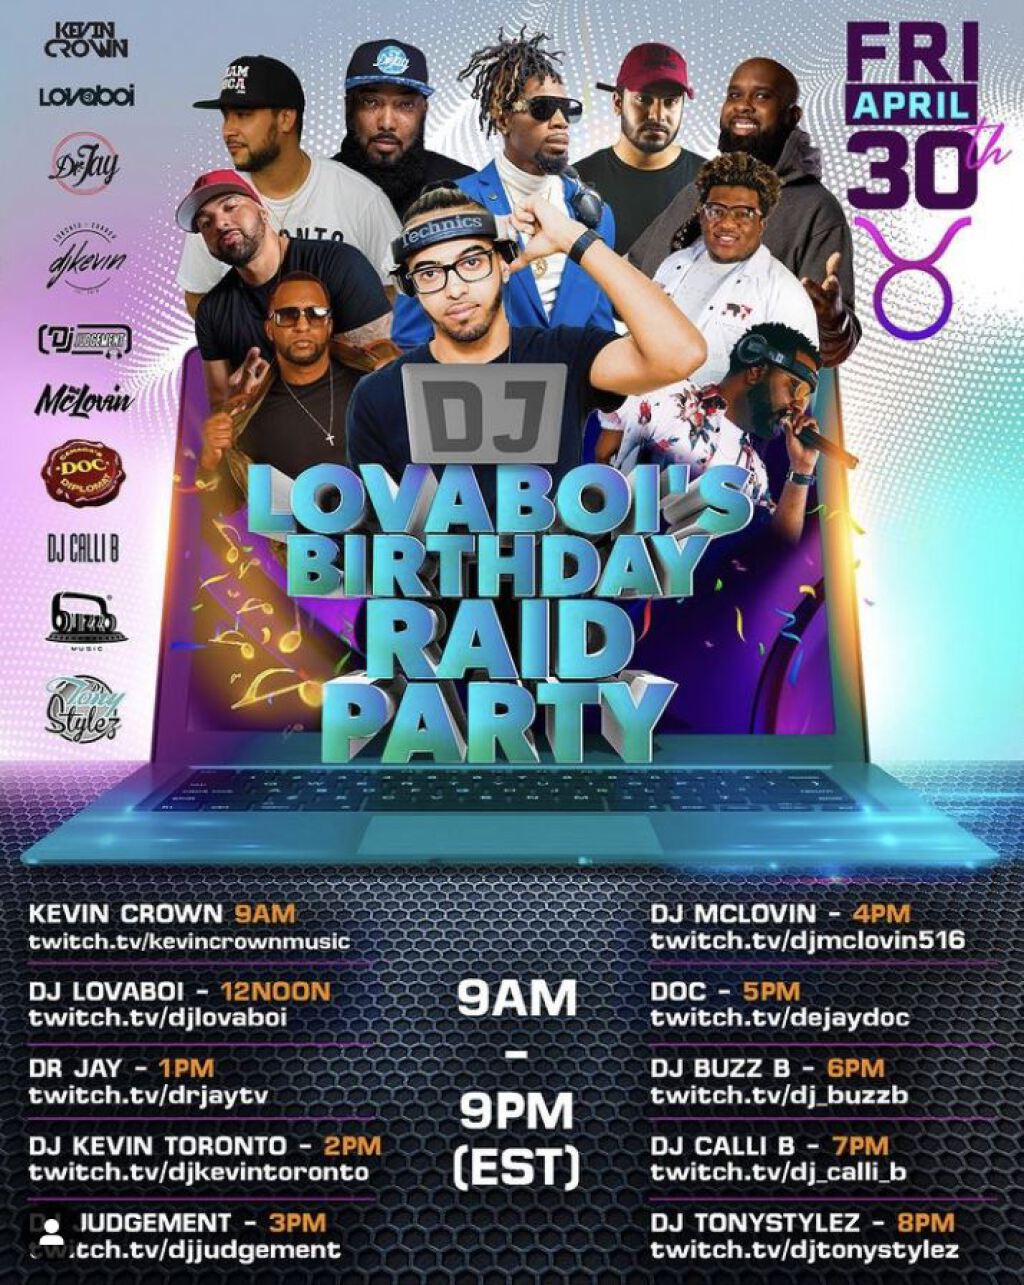 Dj Lovaboi's Birthday Raid Party flyer or graphic.